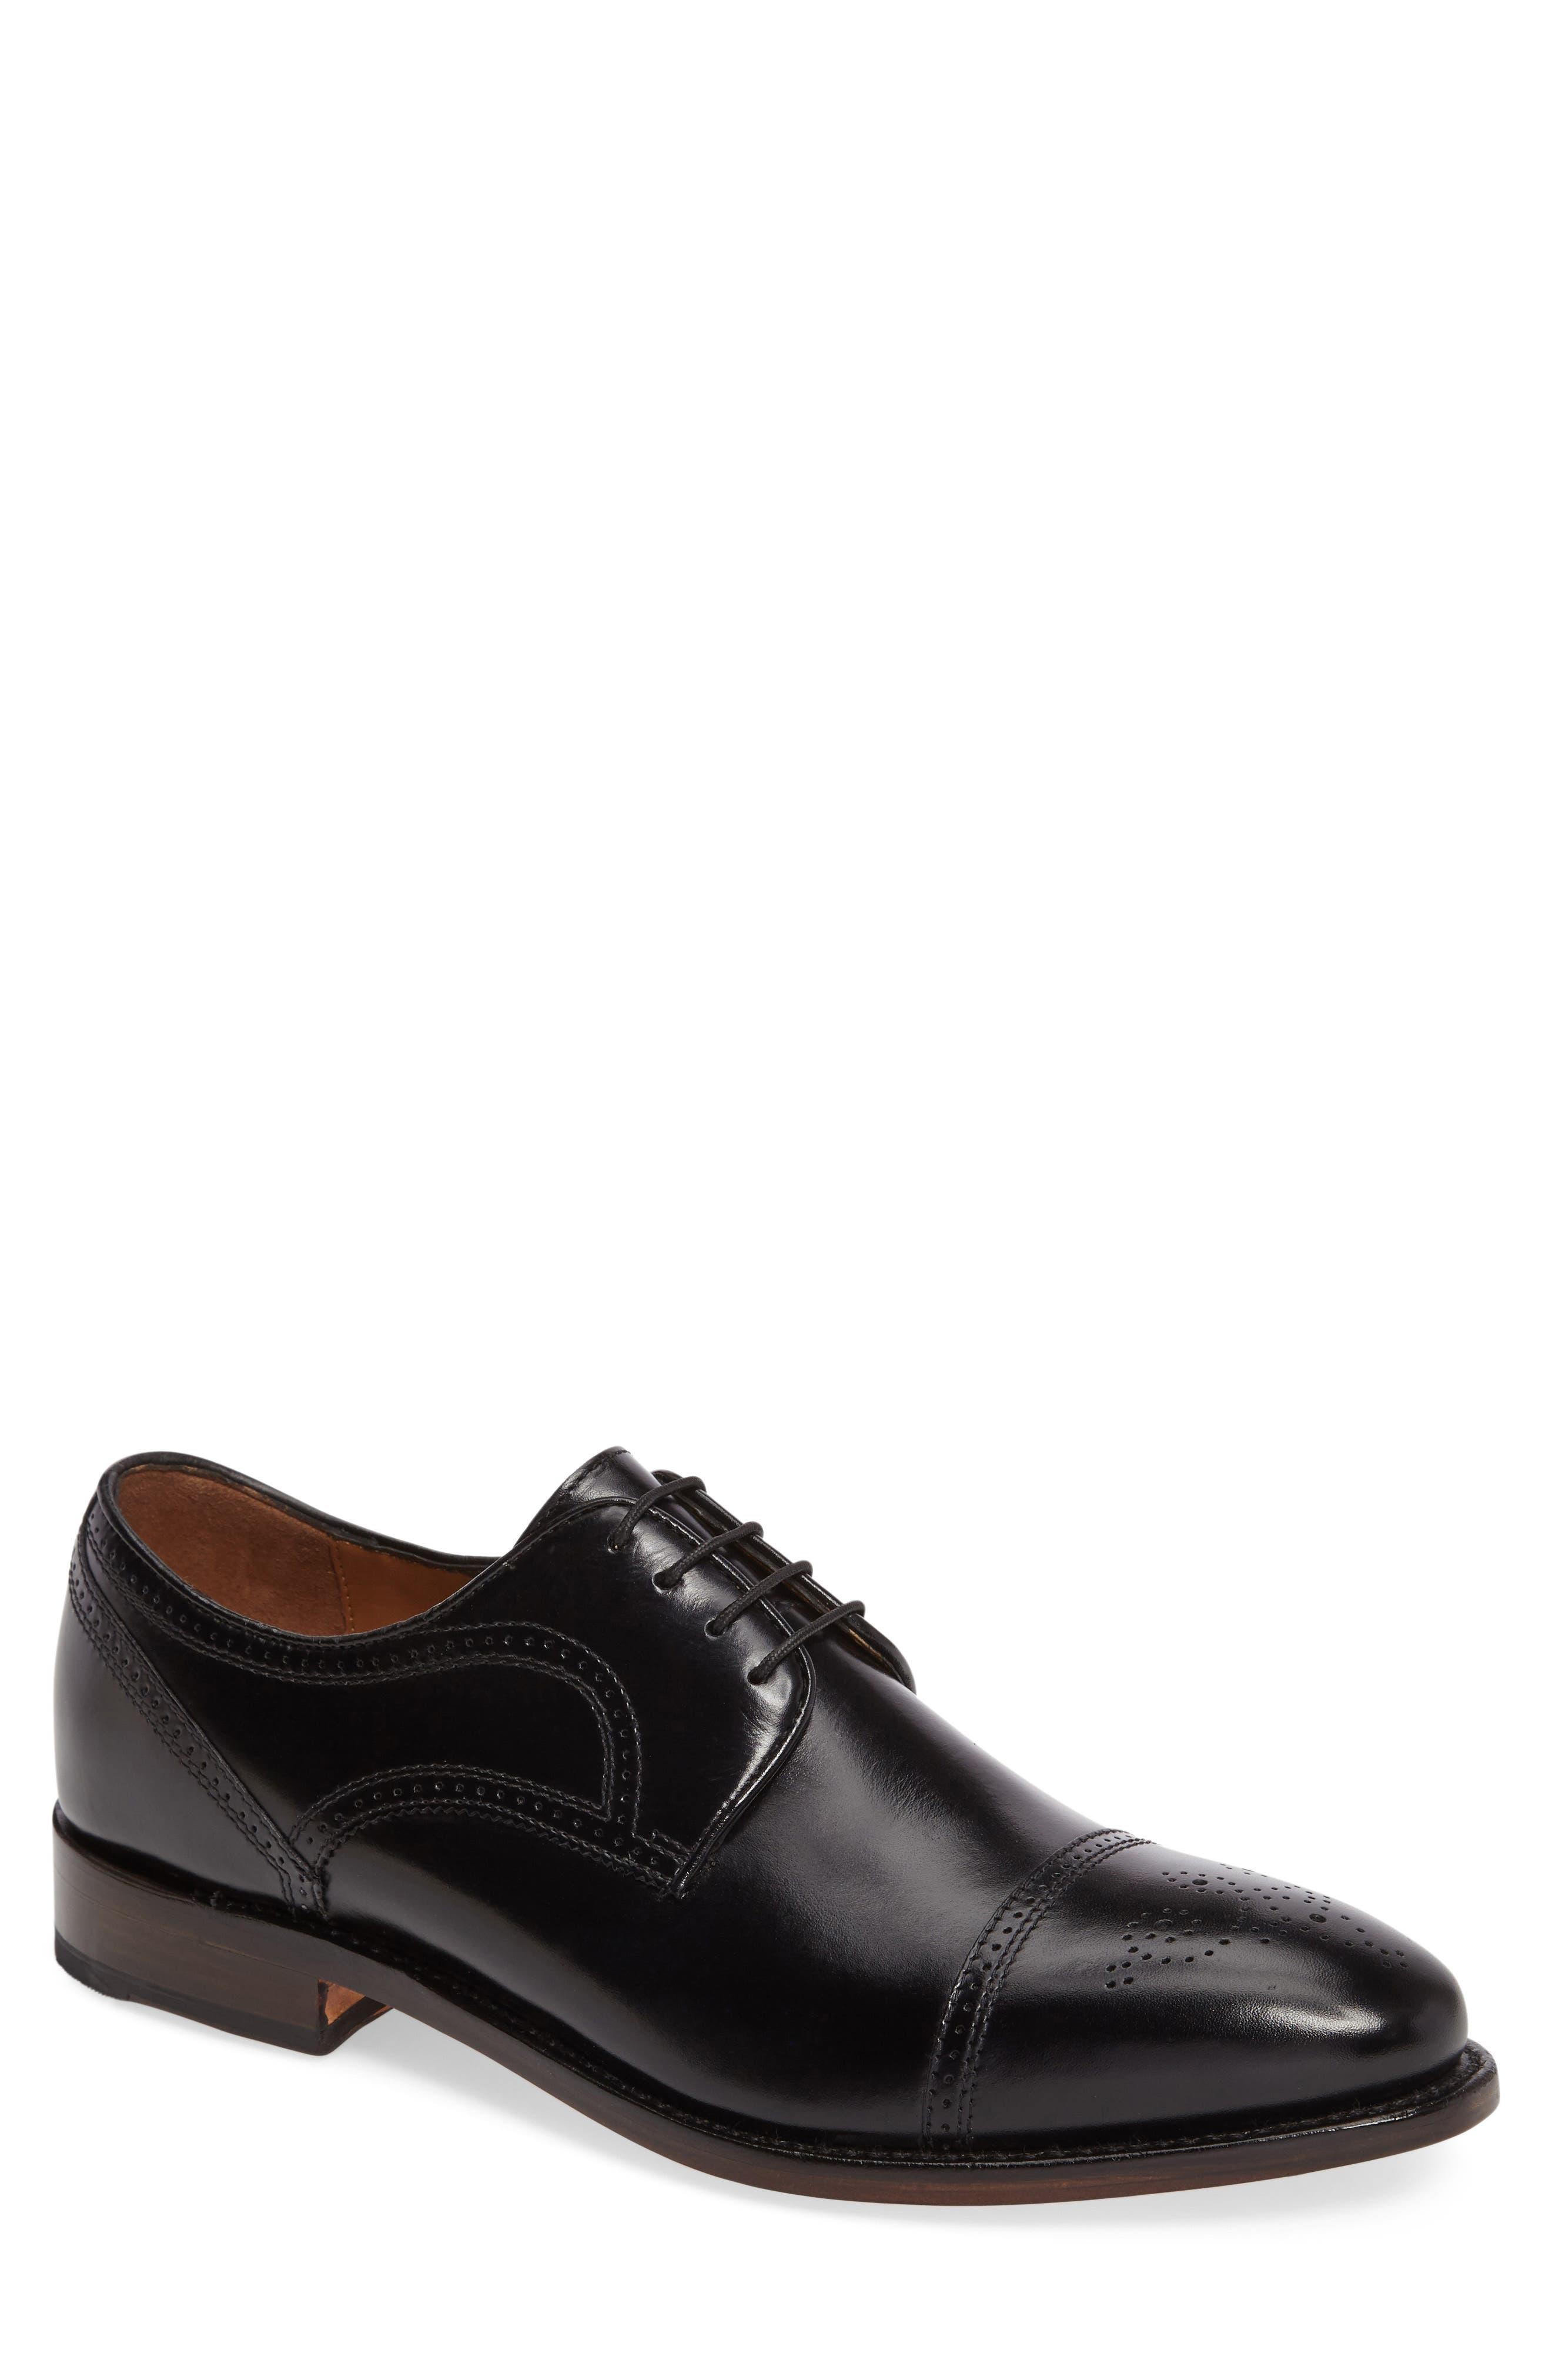 Collins Cap Toe Oxford,                         Main,                         color, BLACK CALFSKIN